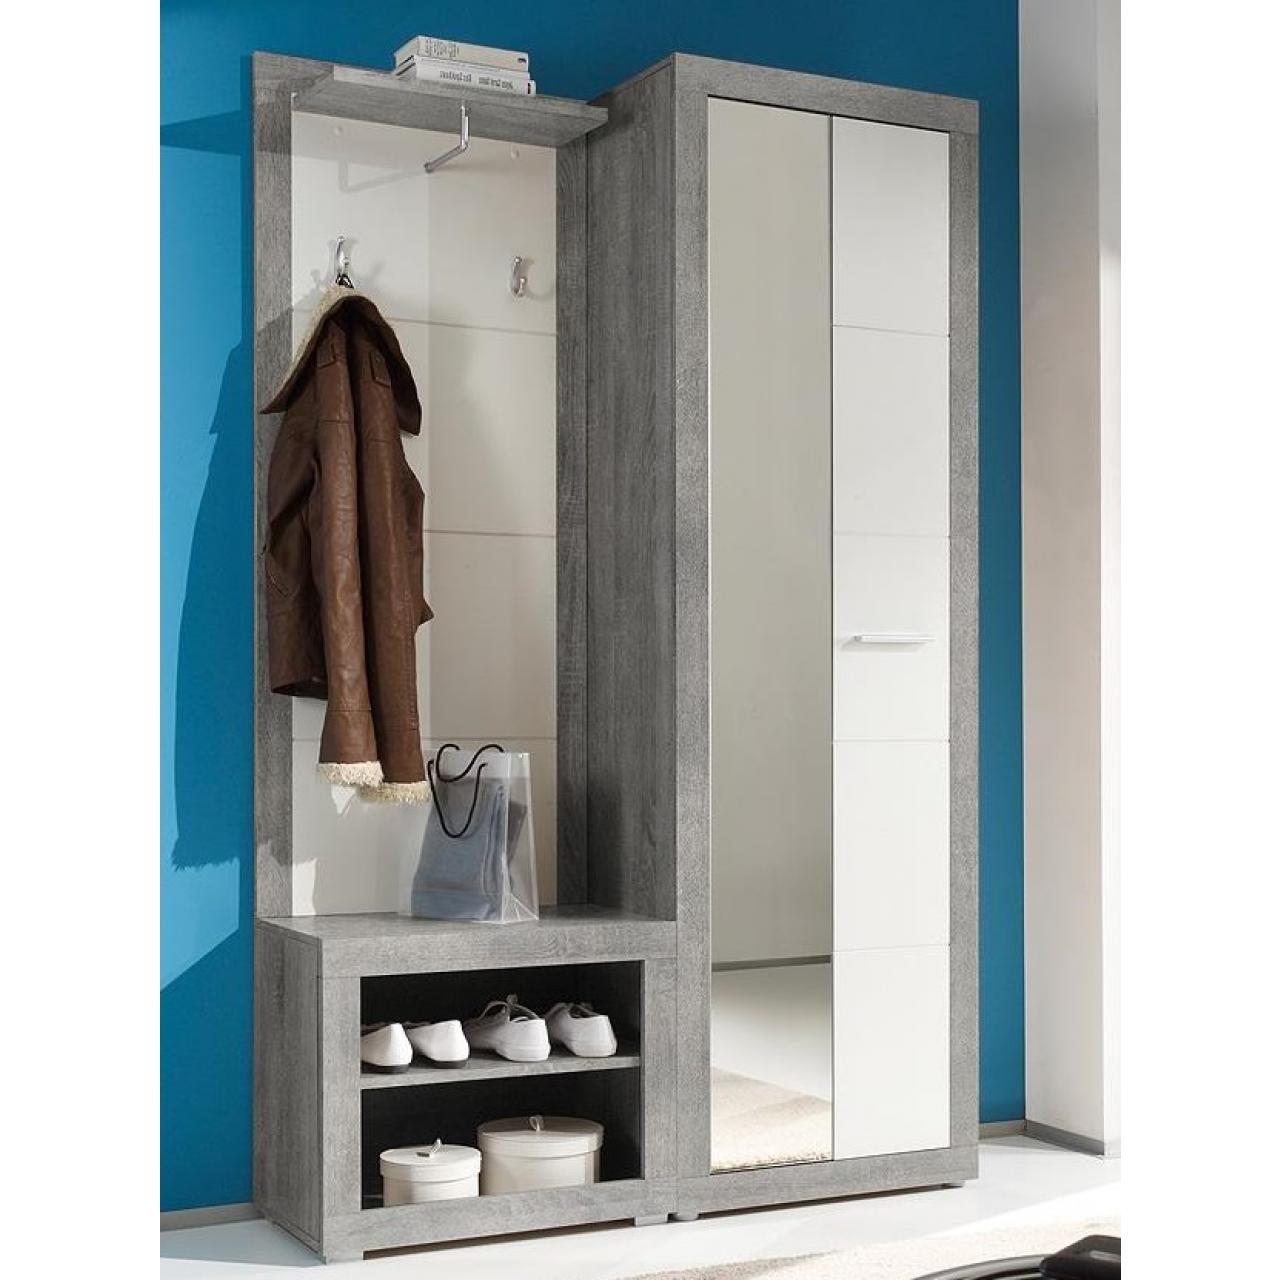 Garderobe Stone Kompaktgarderobe Flurgarderobe Spiegel Beton Weiß Wandgarderobe